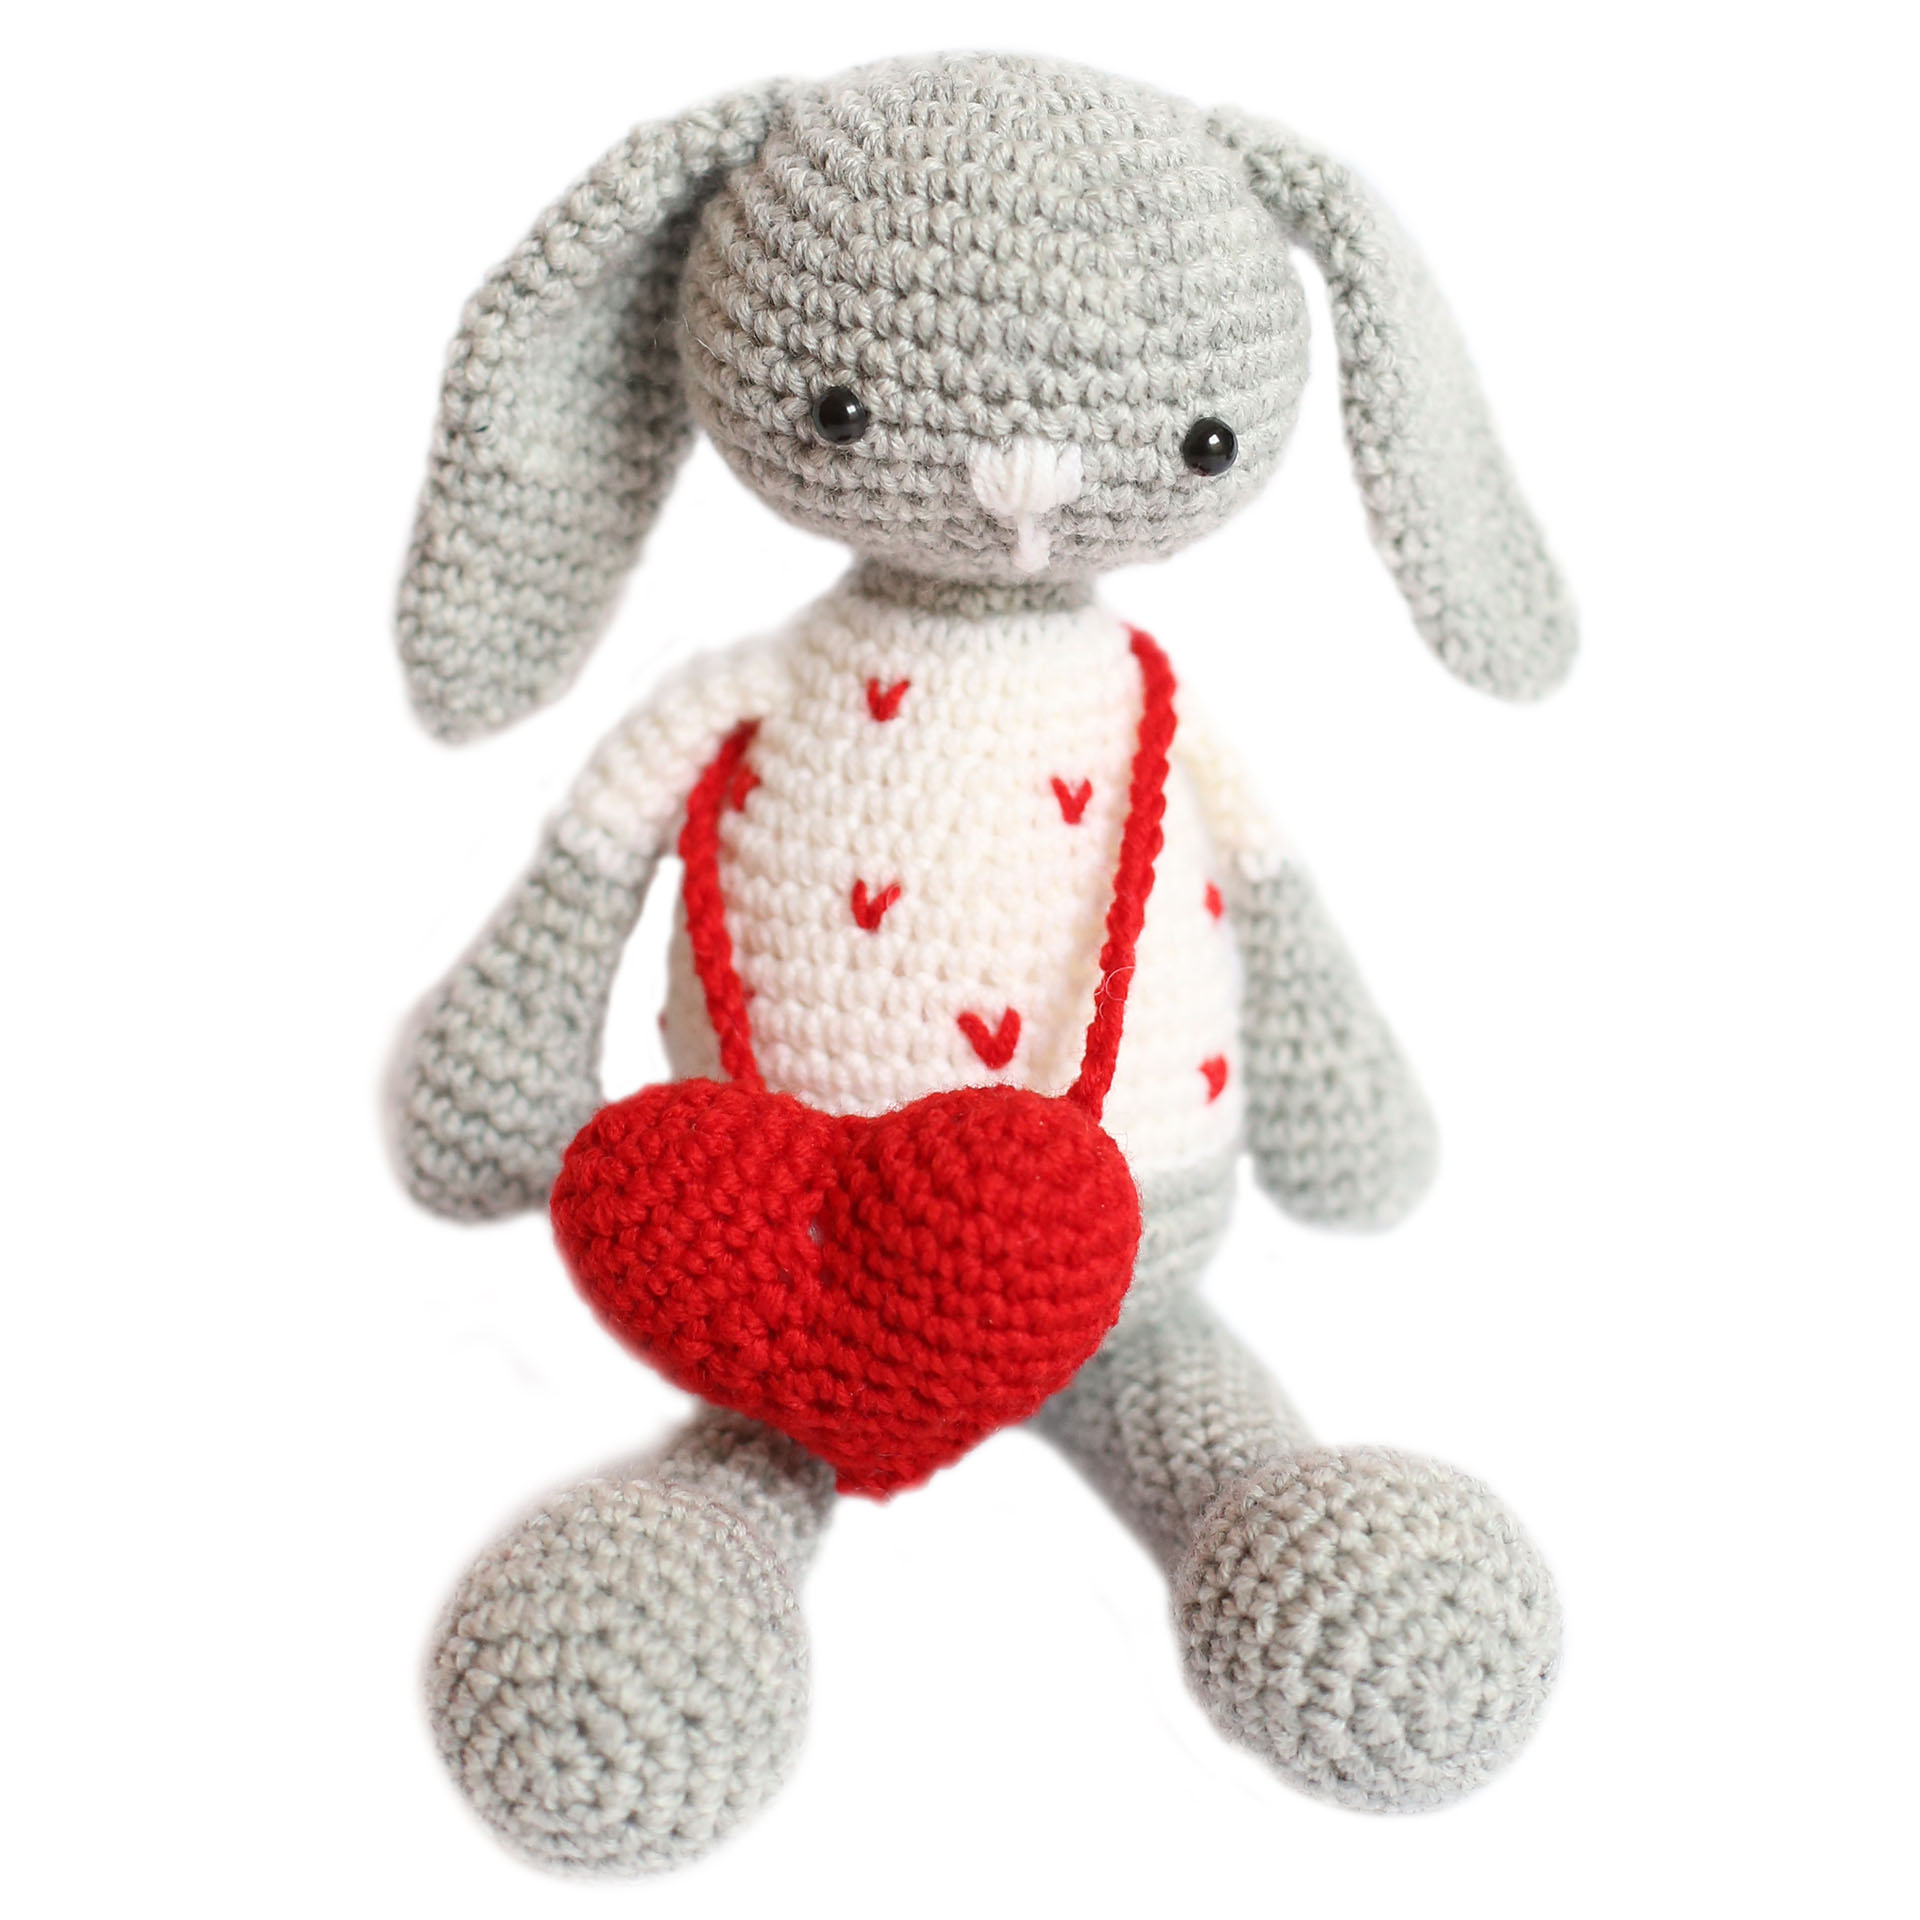 Coniglio Amigurumi Uncinetto : Alessio il coniglio Kit Amigurumi Happy Shop